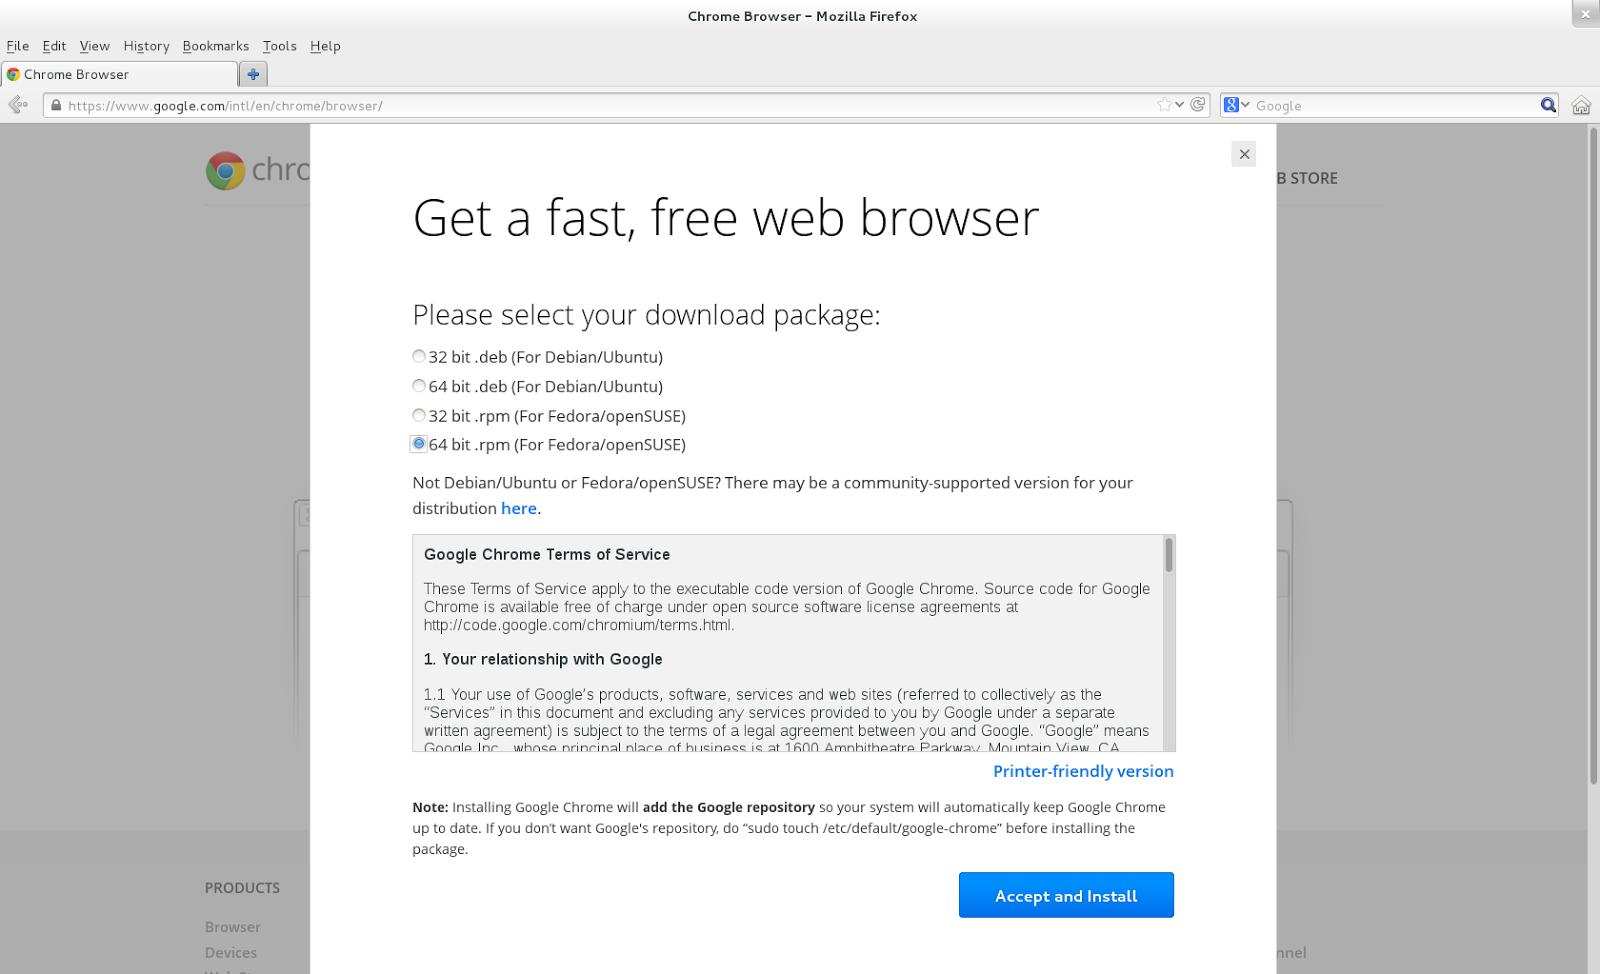 TechnoZeal: Install Google Chrome on Fedora 18